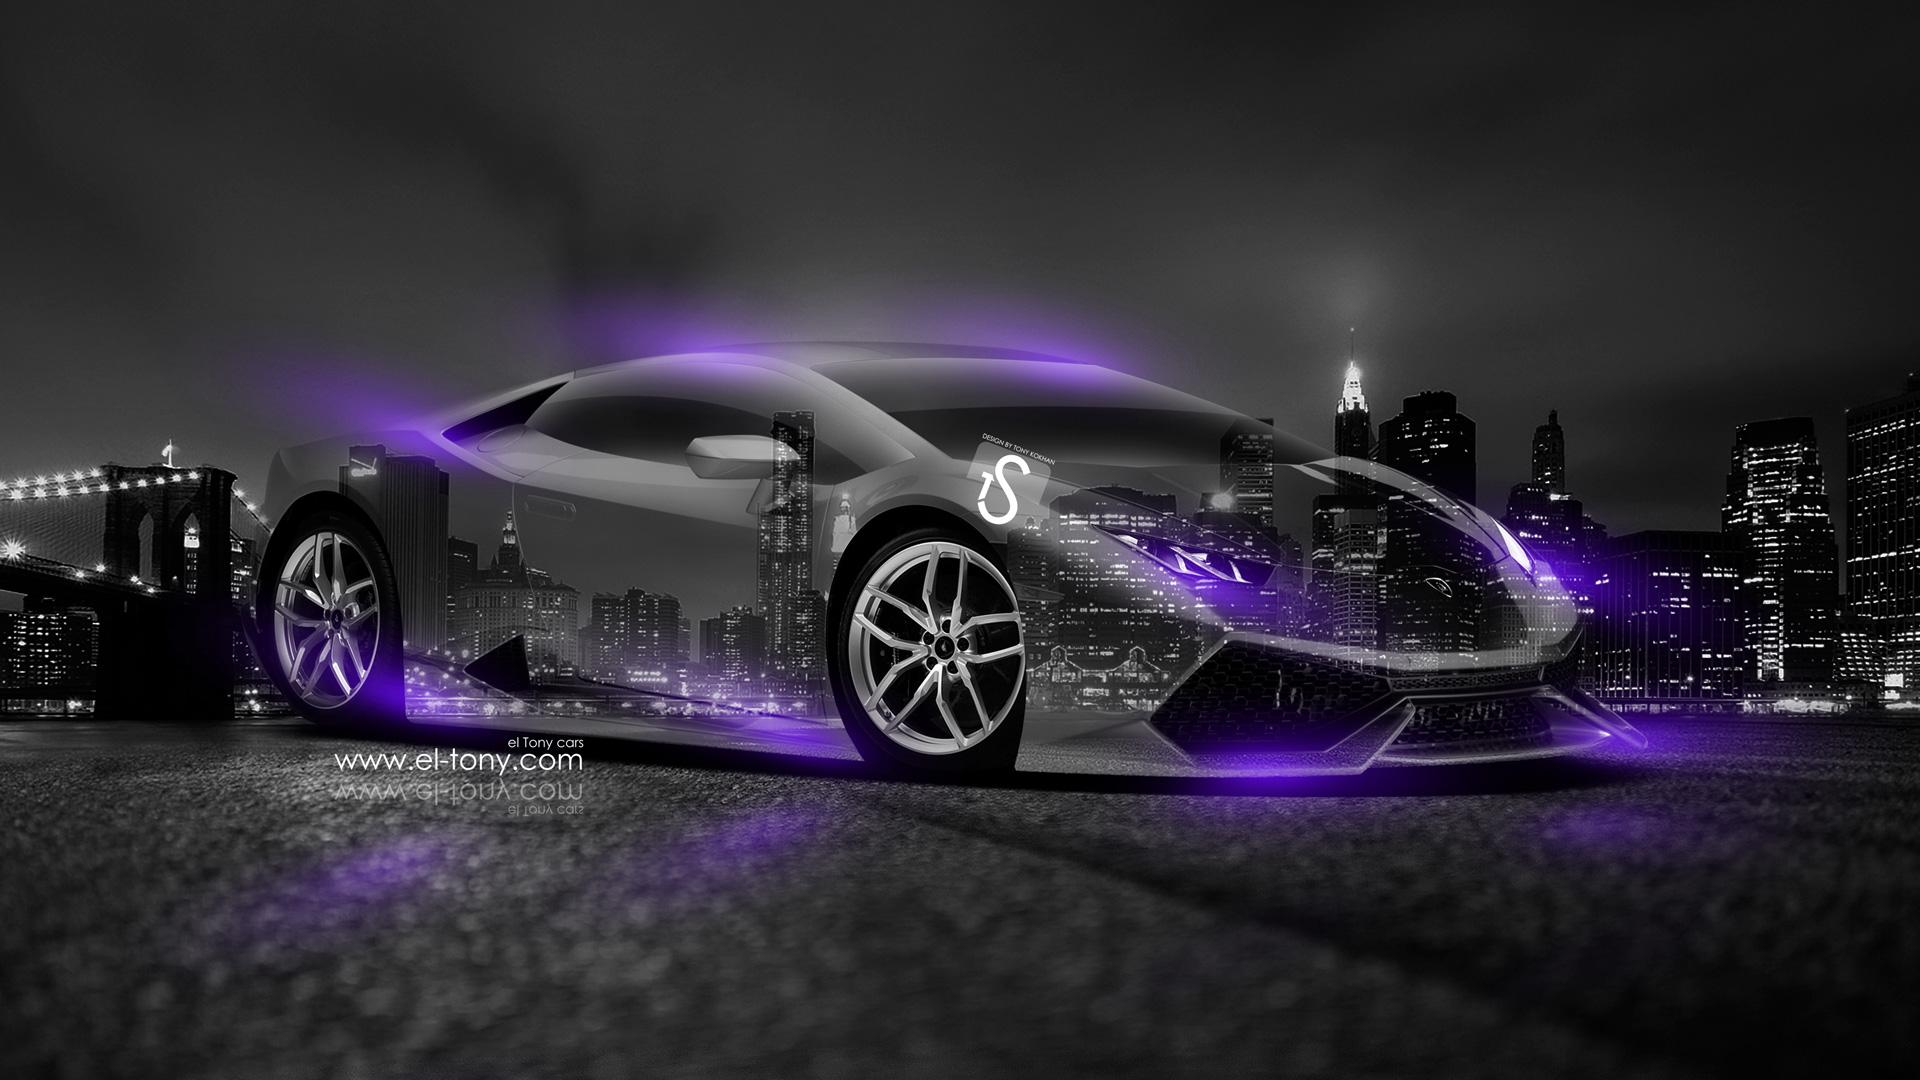 Lamborghini-Huracan-Crystal-City-Car-2014-Violet-Neon-design-by-Tony The New Neon Purple Lamborghini on neon purple prom dresses, neon purple corvette, neon purple dragon, neon glowing lambo, neon purple beats, neon purple backgrounds, gold lamborghini, glow in the dark lamborghini, blue lamborghini, chrome lamborghini, grey lamborghini, neon range rover, neon purple ferrari, pink lamborghini, lime lamborghini, neon blue and purple, neon purple cars, cream lamborghini, neon purple converse, neon purple mustang,